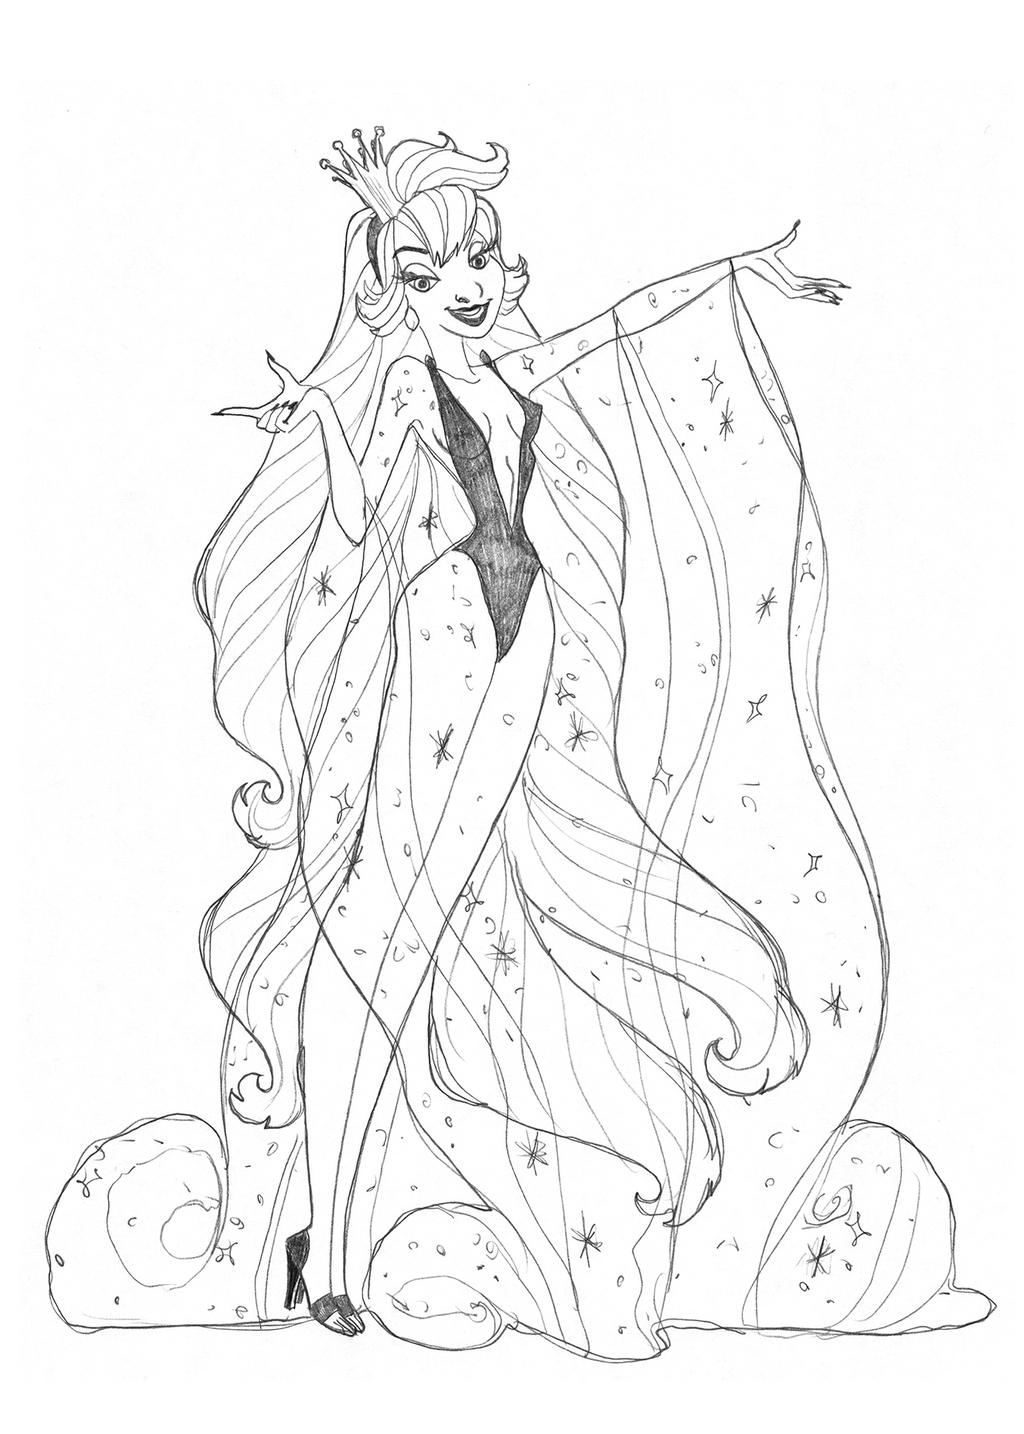 Nude princess daphne #13